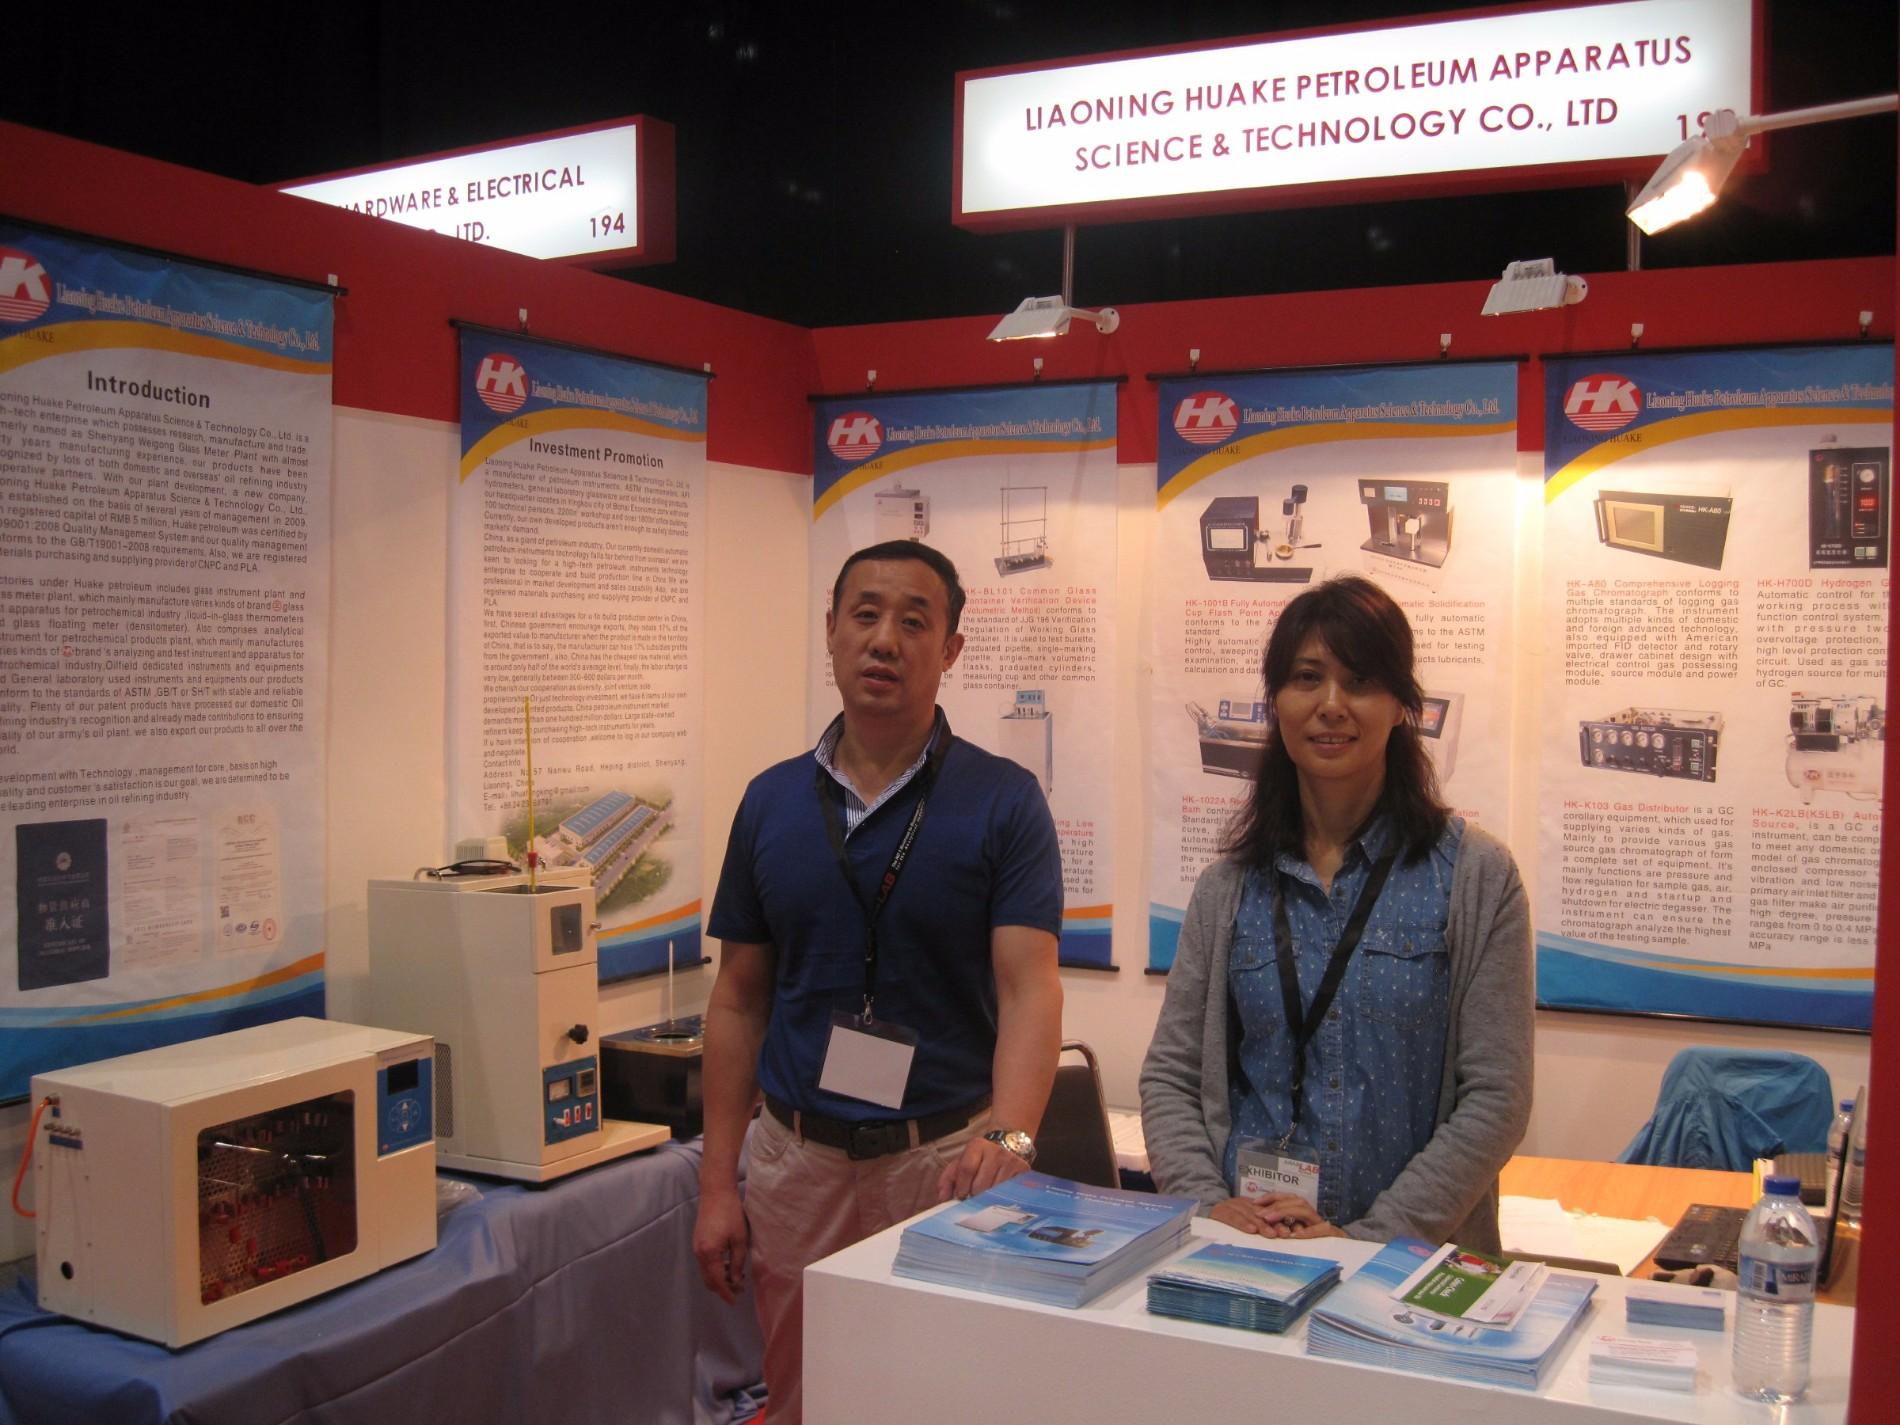 Liaoning HK at Arab Exhibition